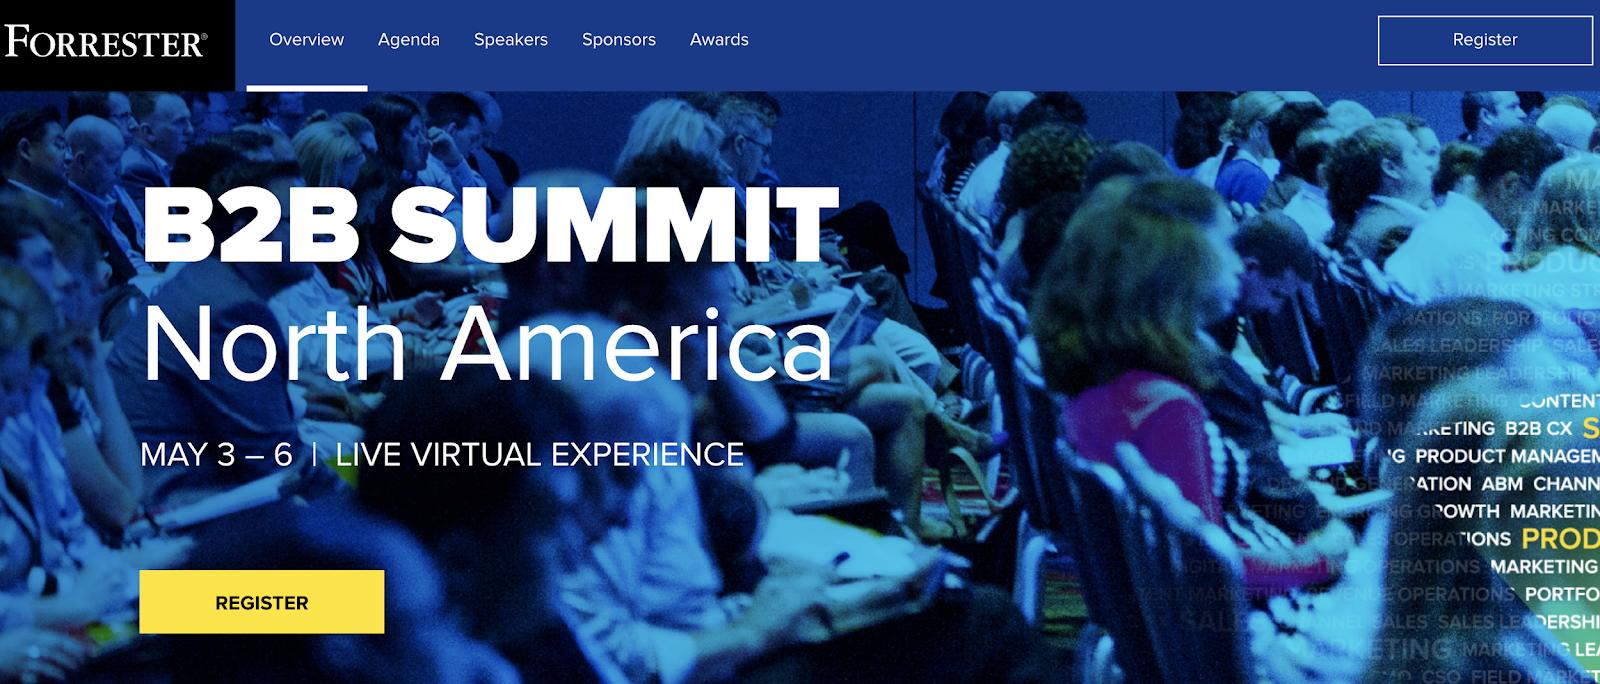 B2B summit North America